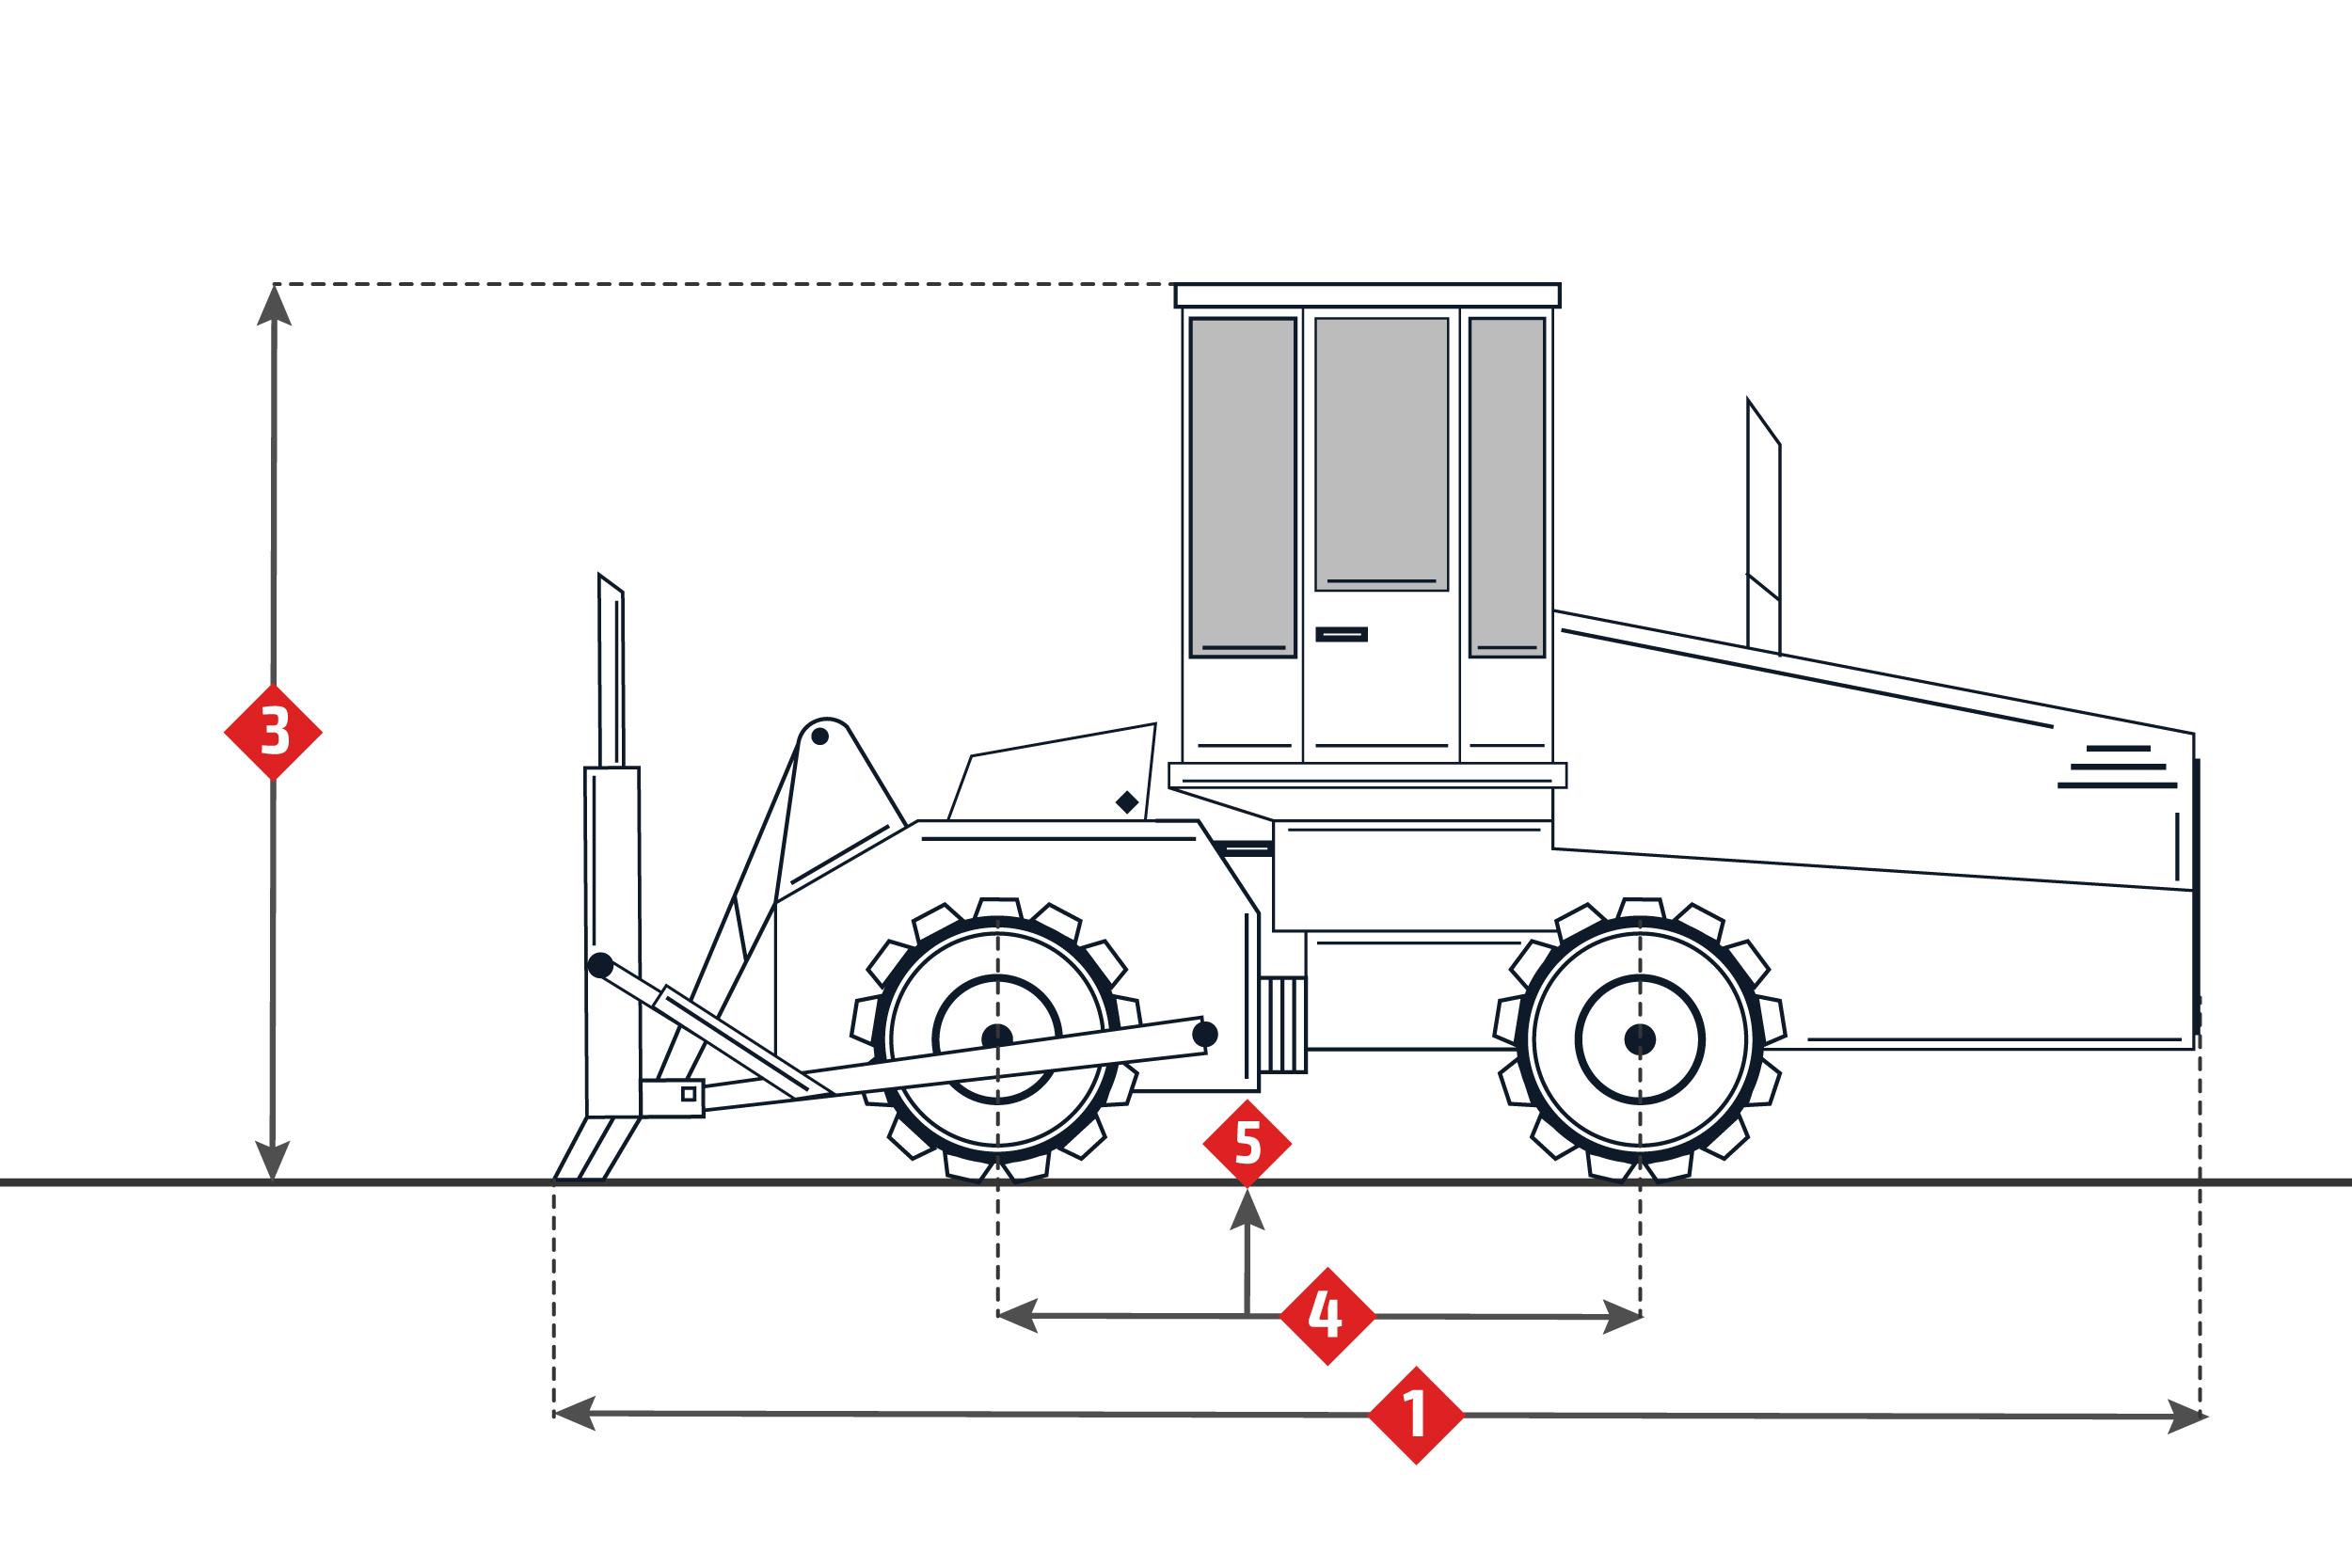 Caterpillar 825c Specifications Roller Compactor